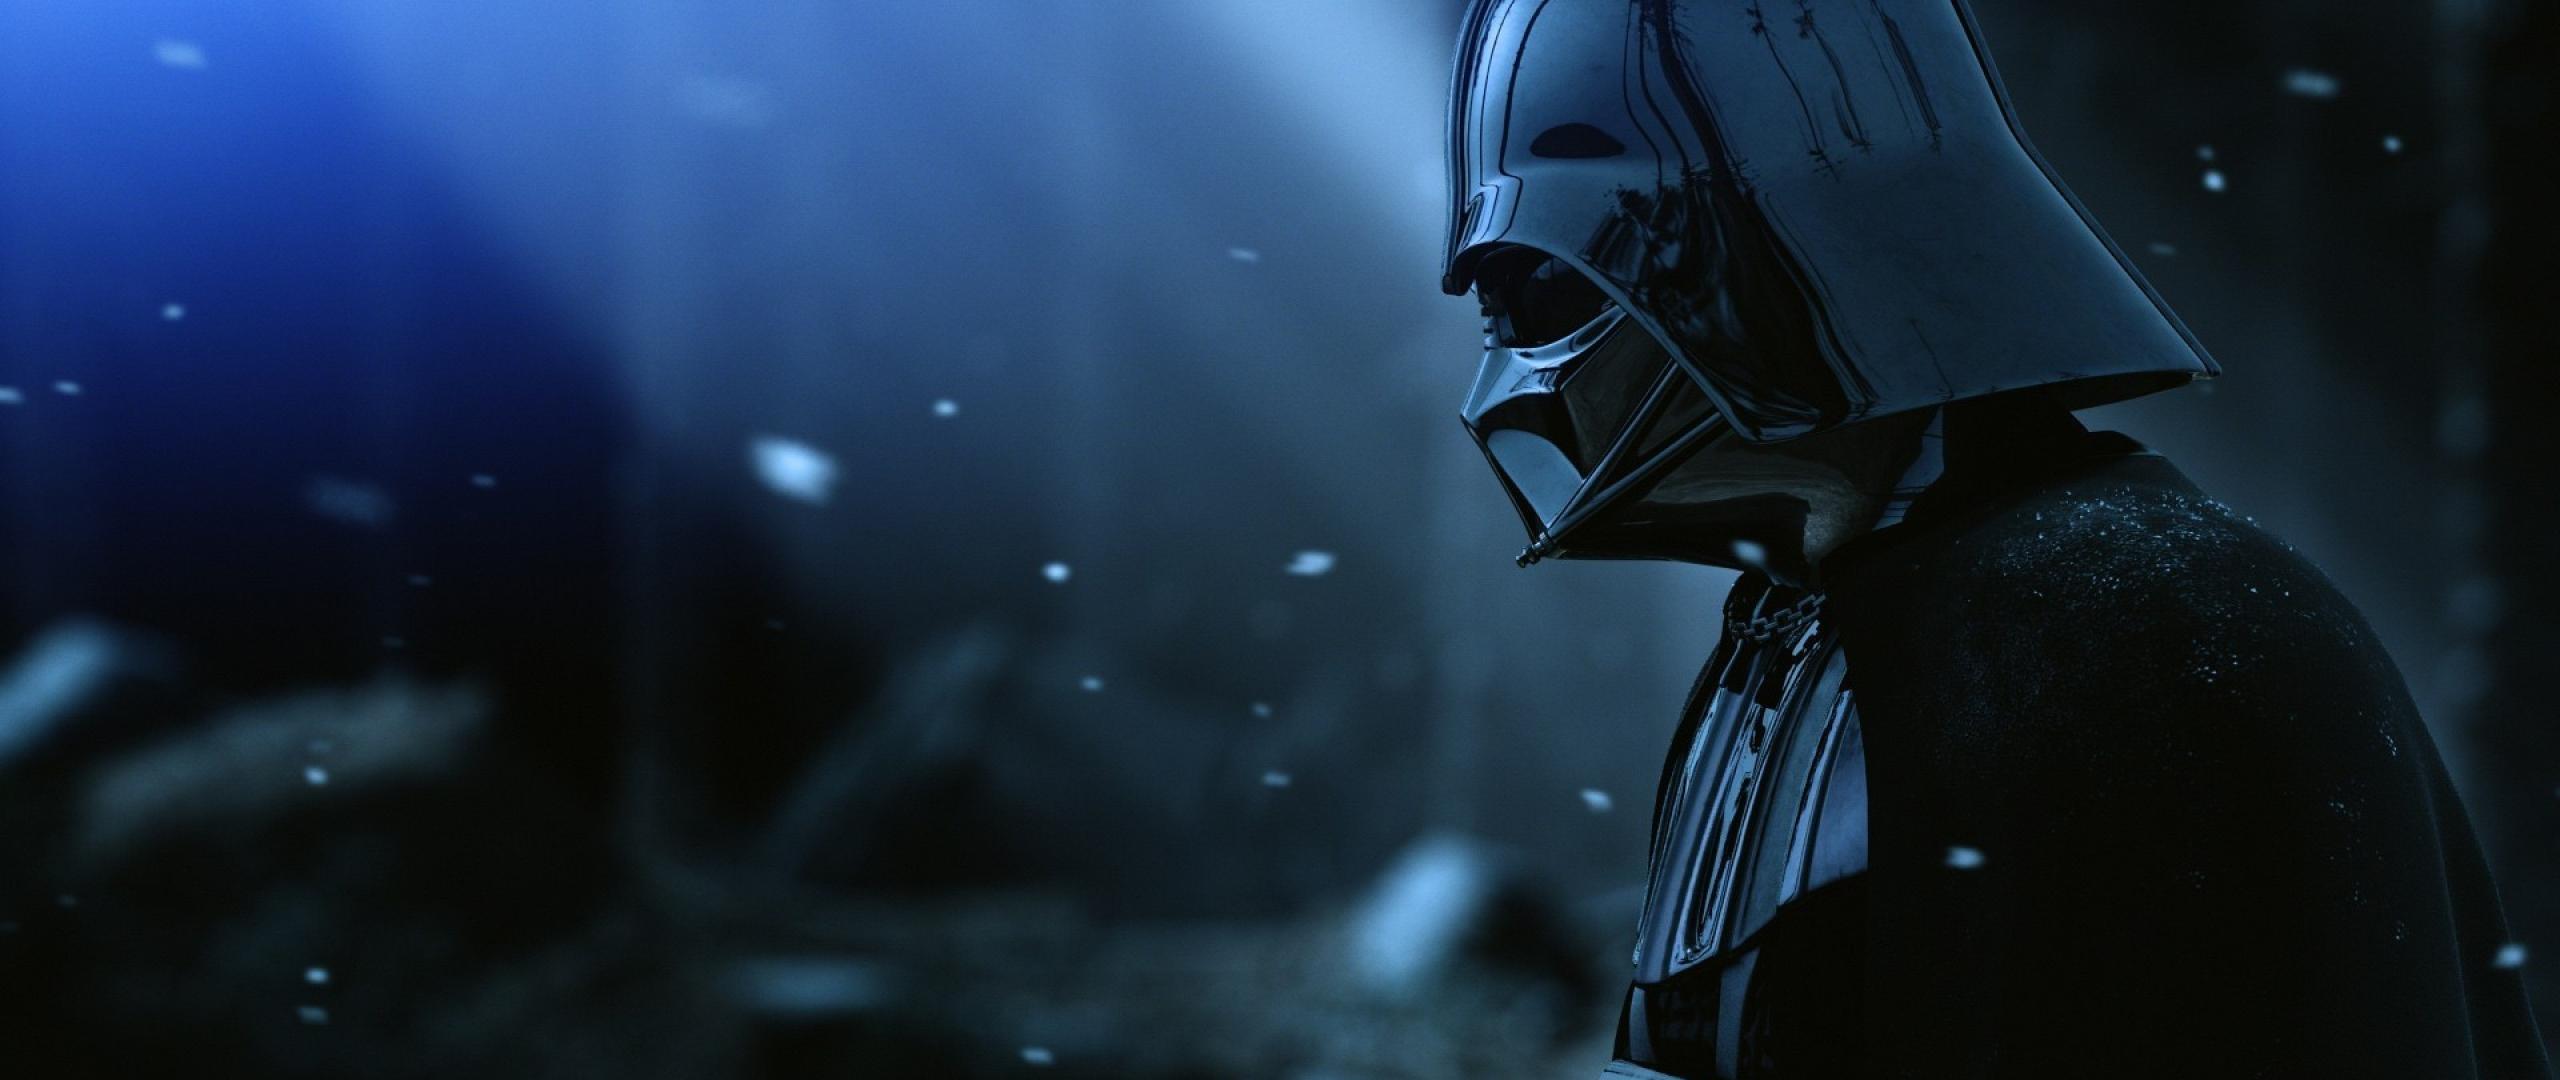 Download Wallpaper 2560x1080 Darth vader Armor Star wars Film Hat 2560x1080